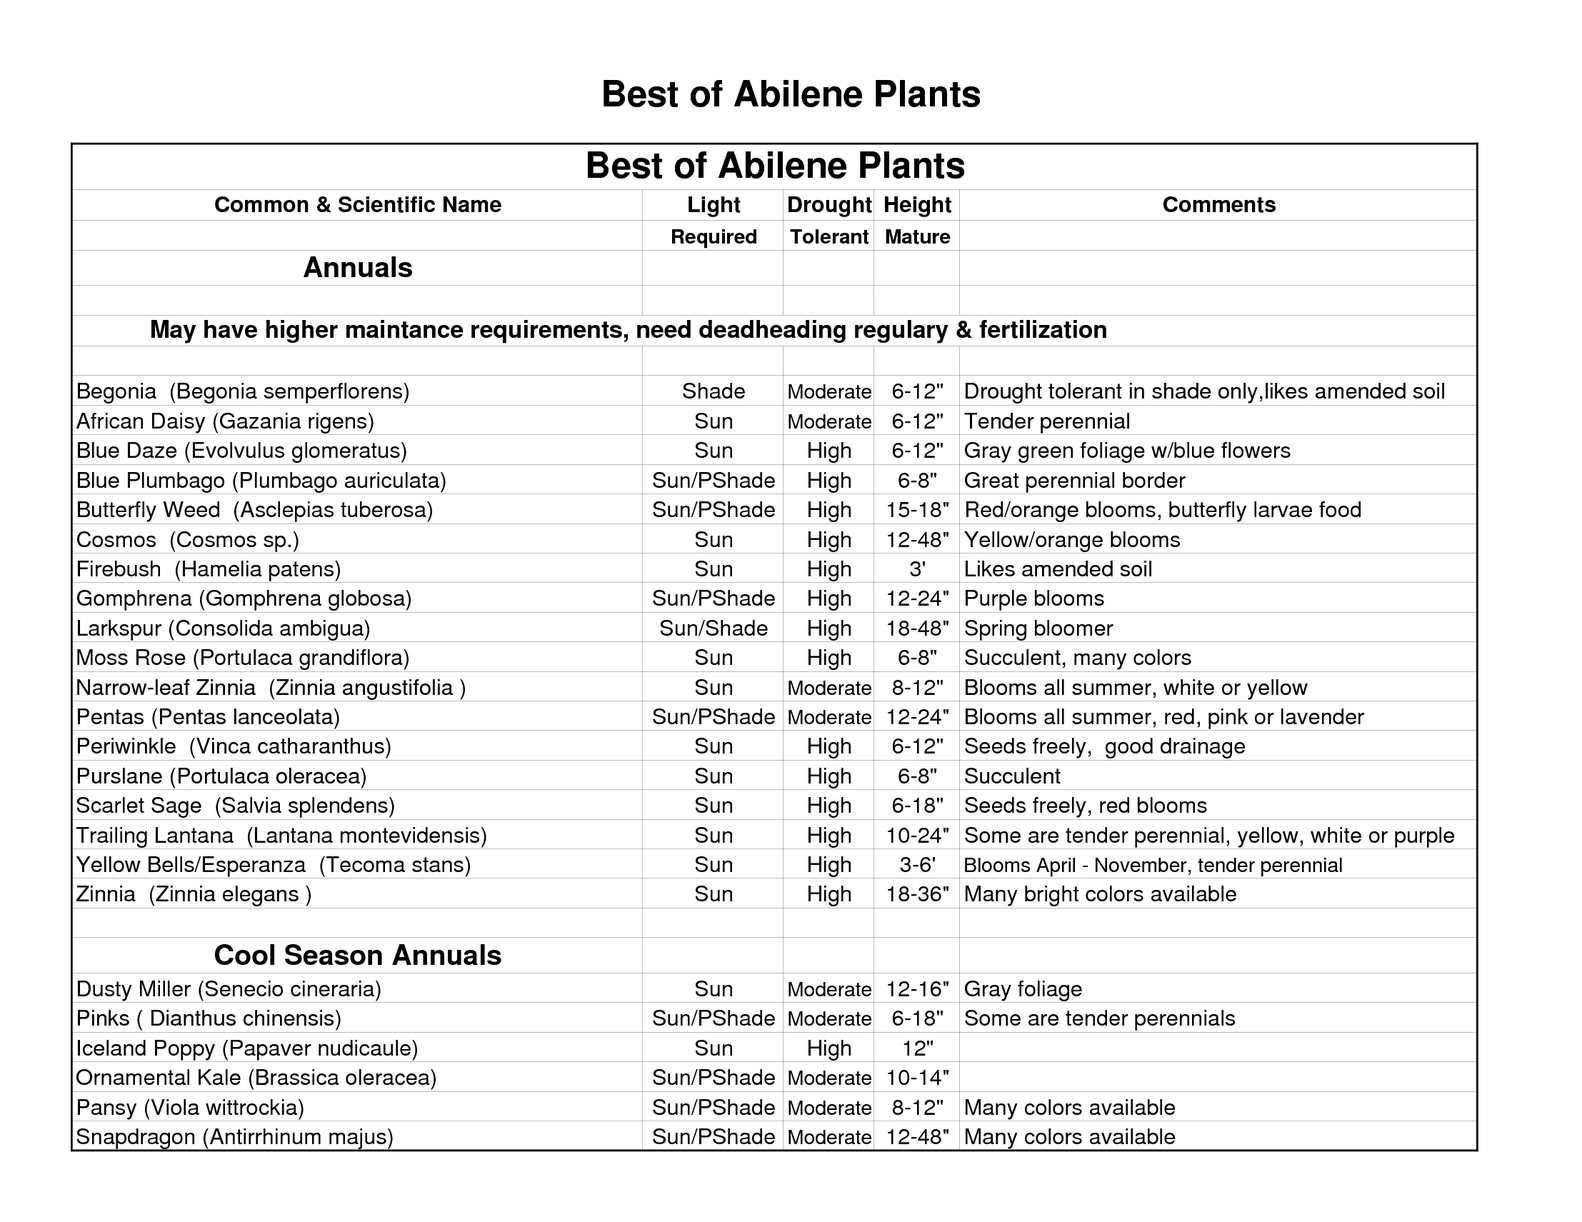 Best Xeriscape Plants For Abilene, Texas